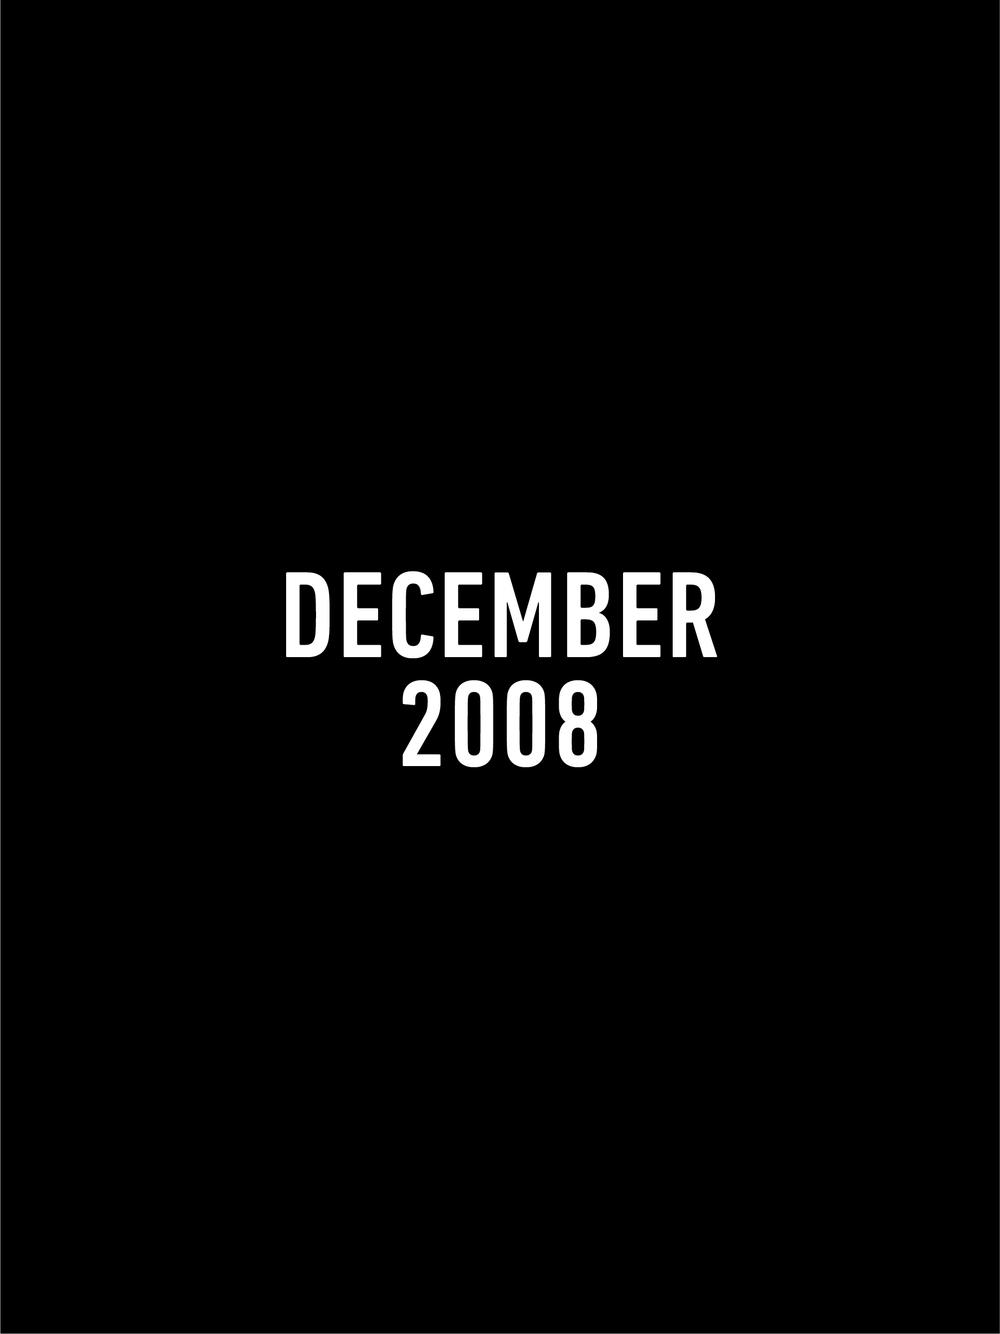 2008 monthly12.jpg